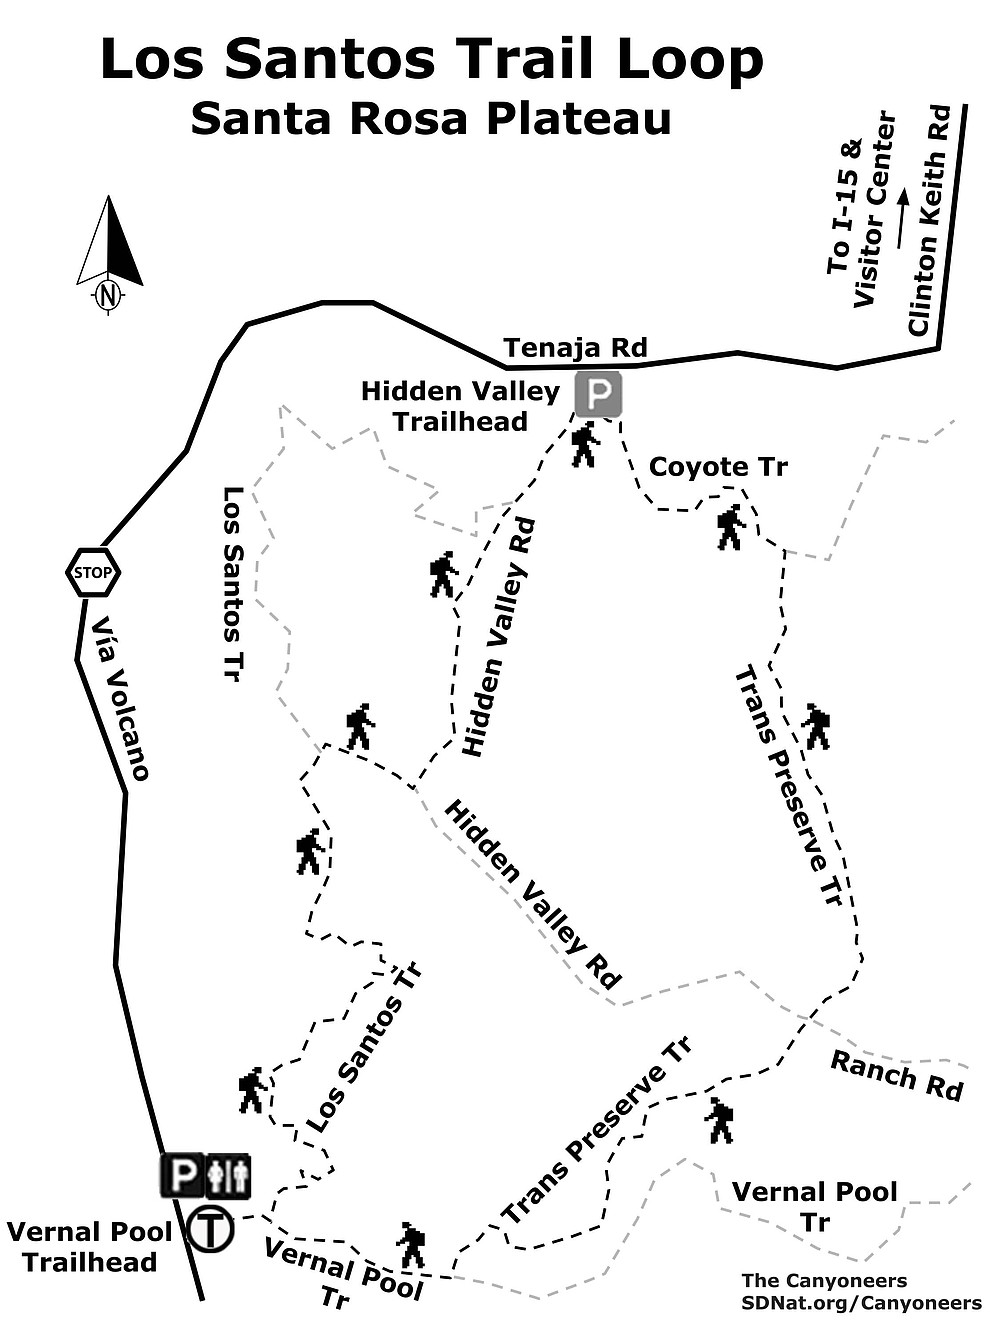 Los Santos Trail Loop map